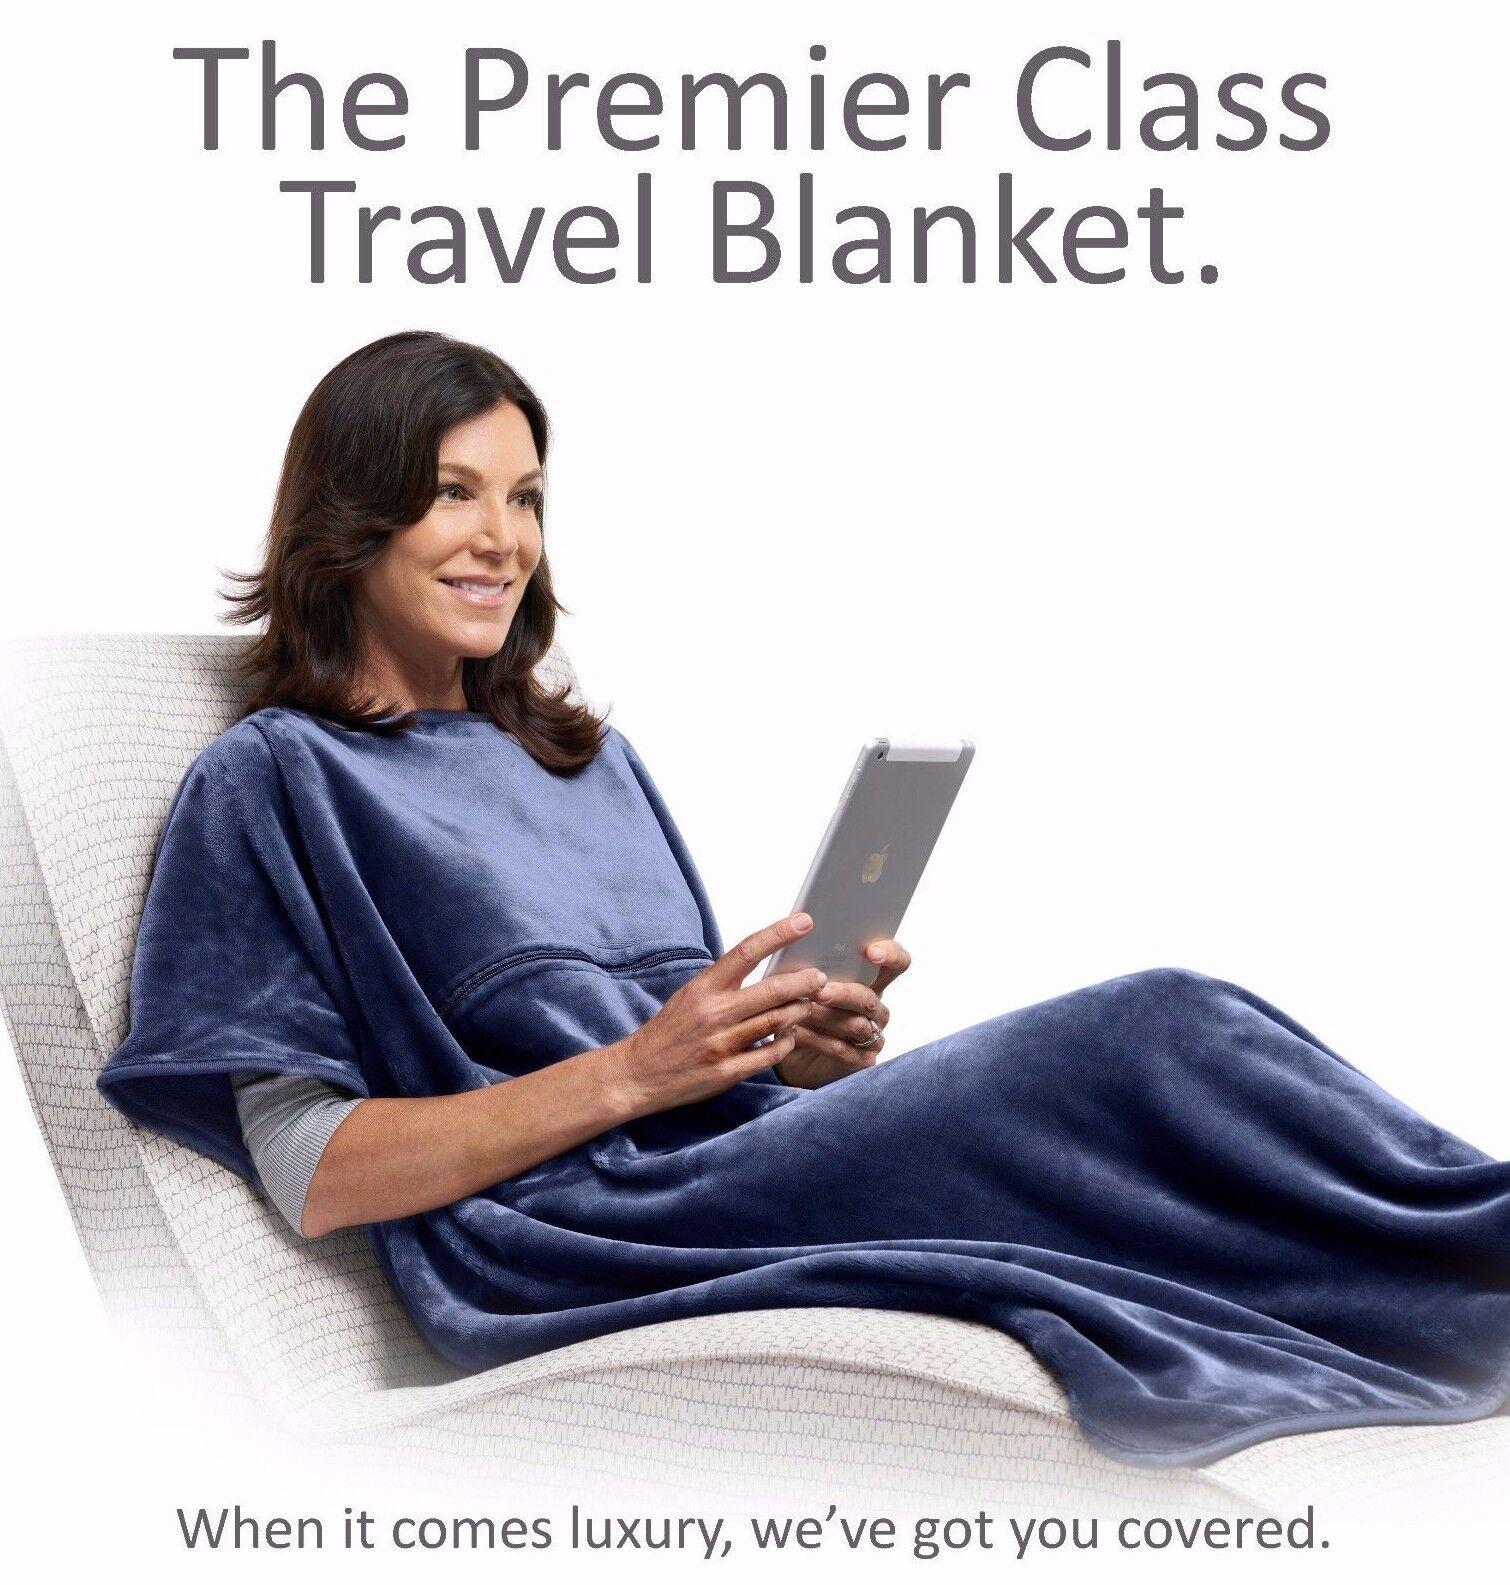 Travelrest - Premier Class Travel Blanket